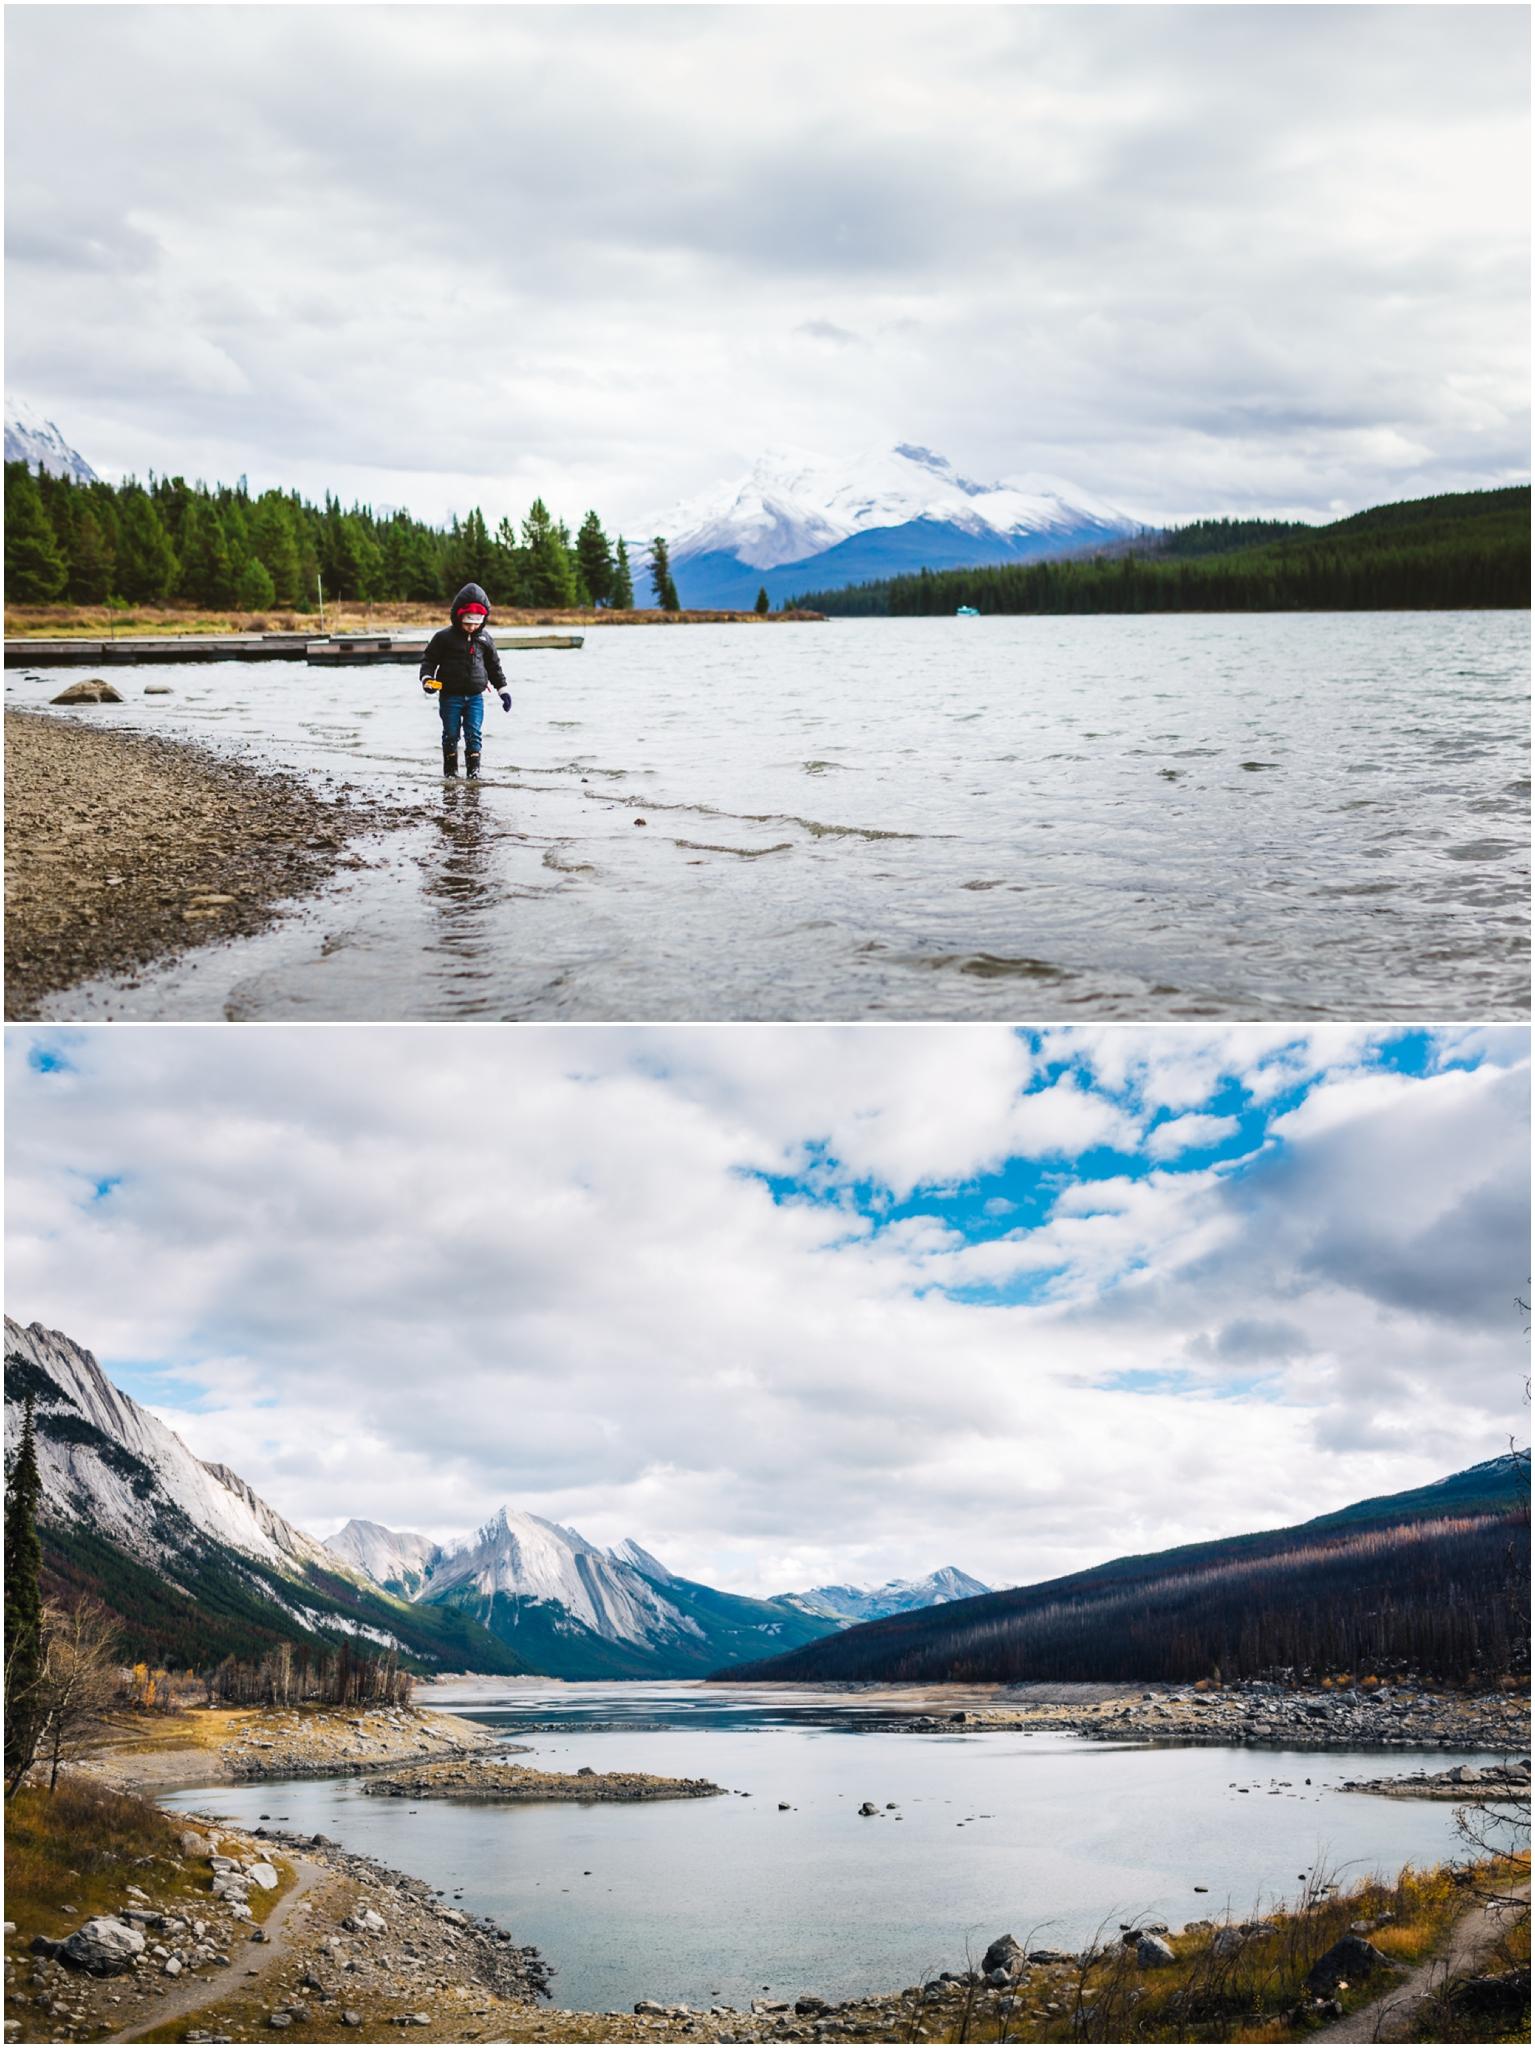 Edmonton Travel Photographer - Best of 2016 - Maligne Lake - Medicine Lake - October - Rocky Mountains - Explore Alberta - Travel Alberta